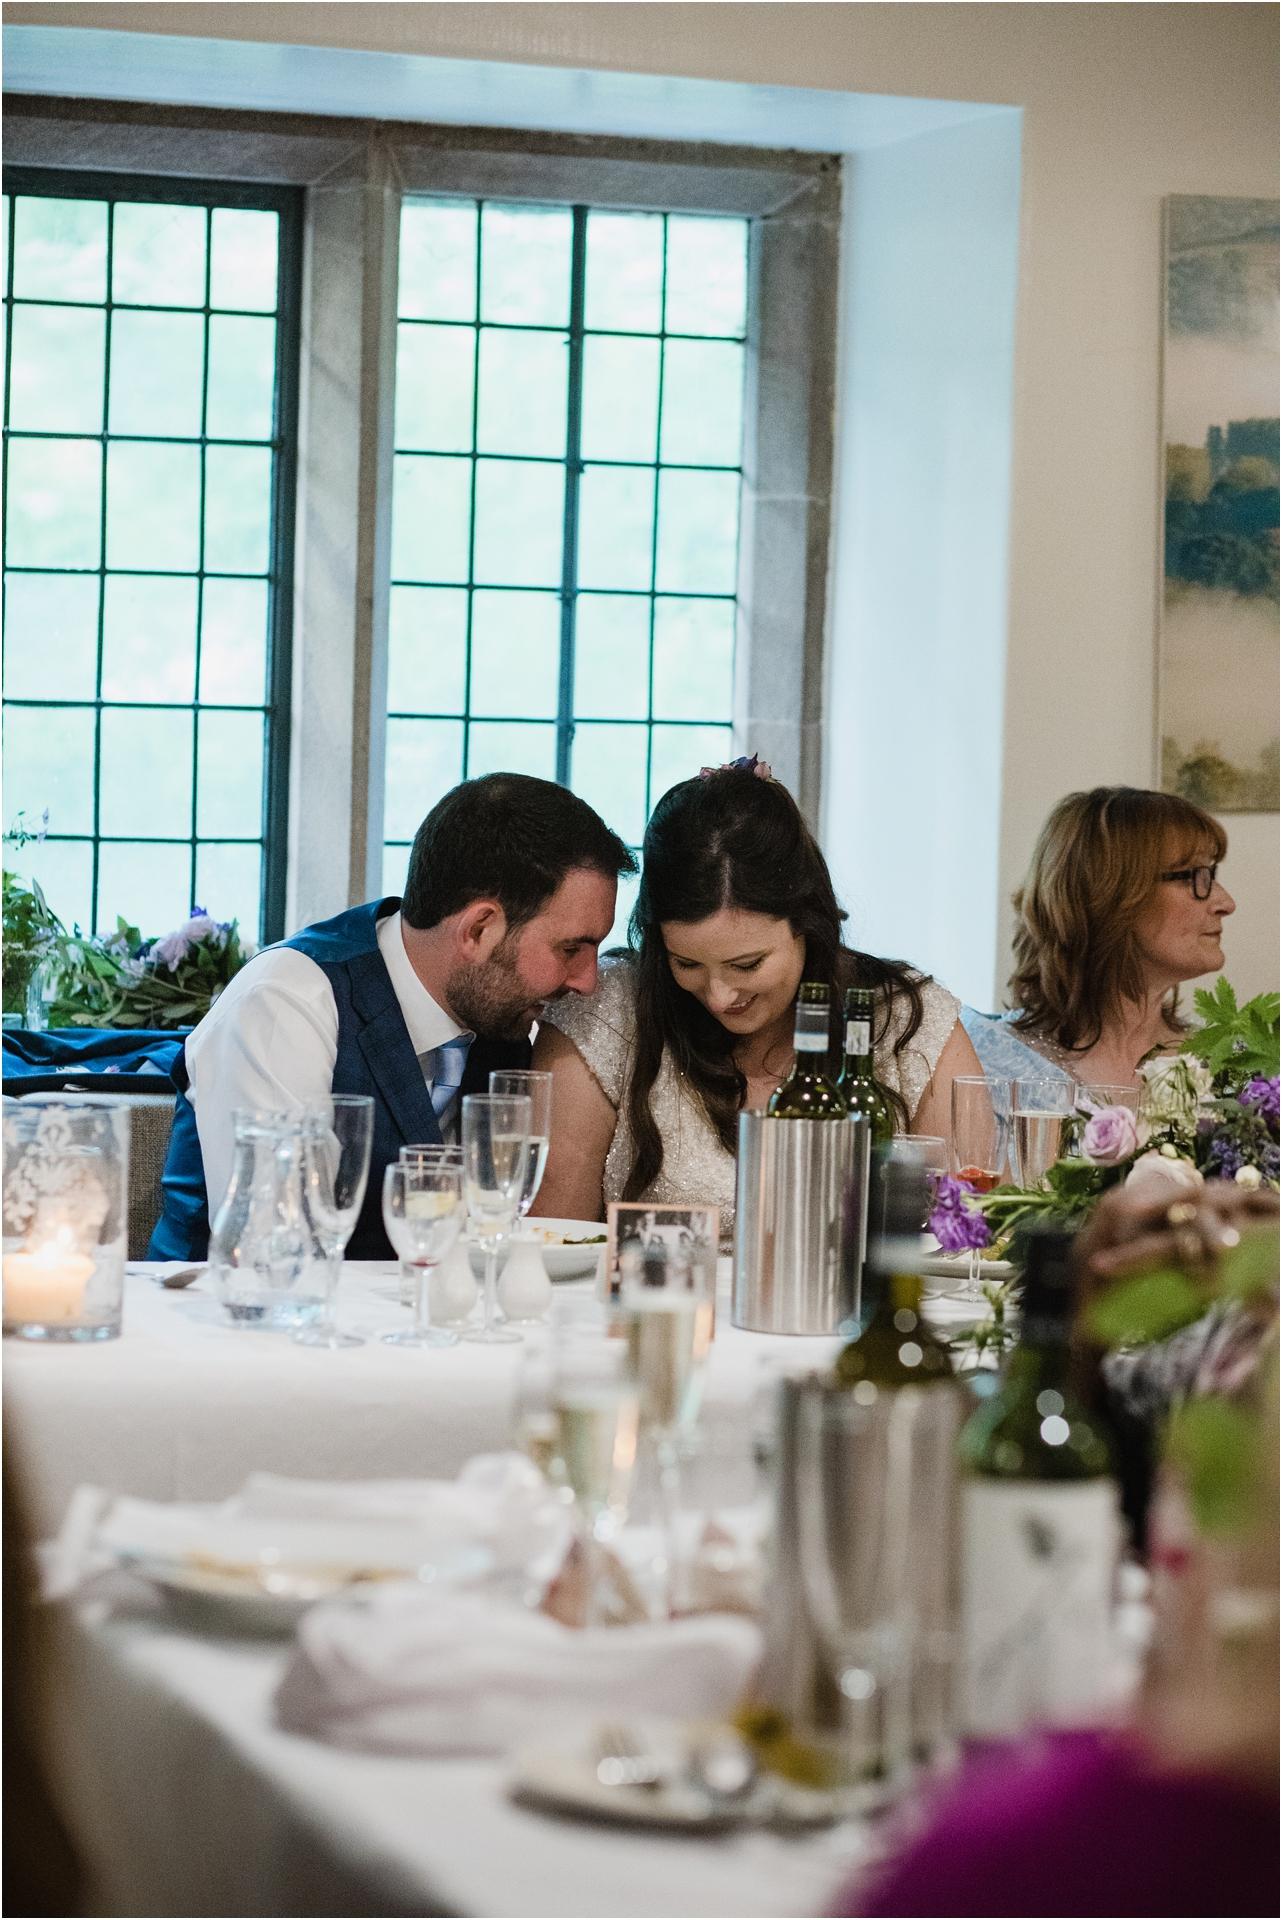 Moment between bride and groom Haddon Hall